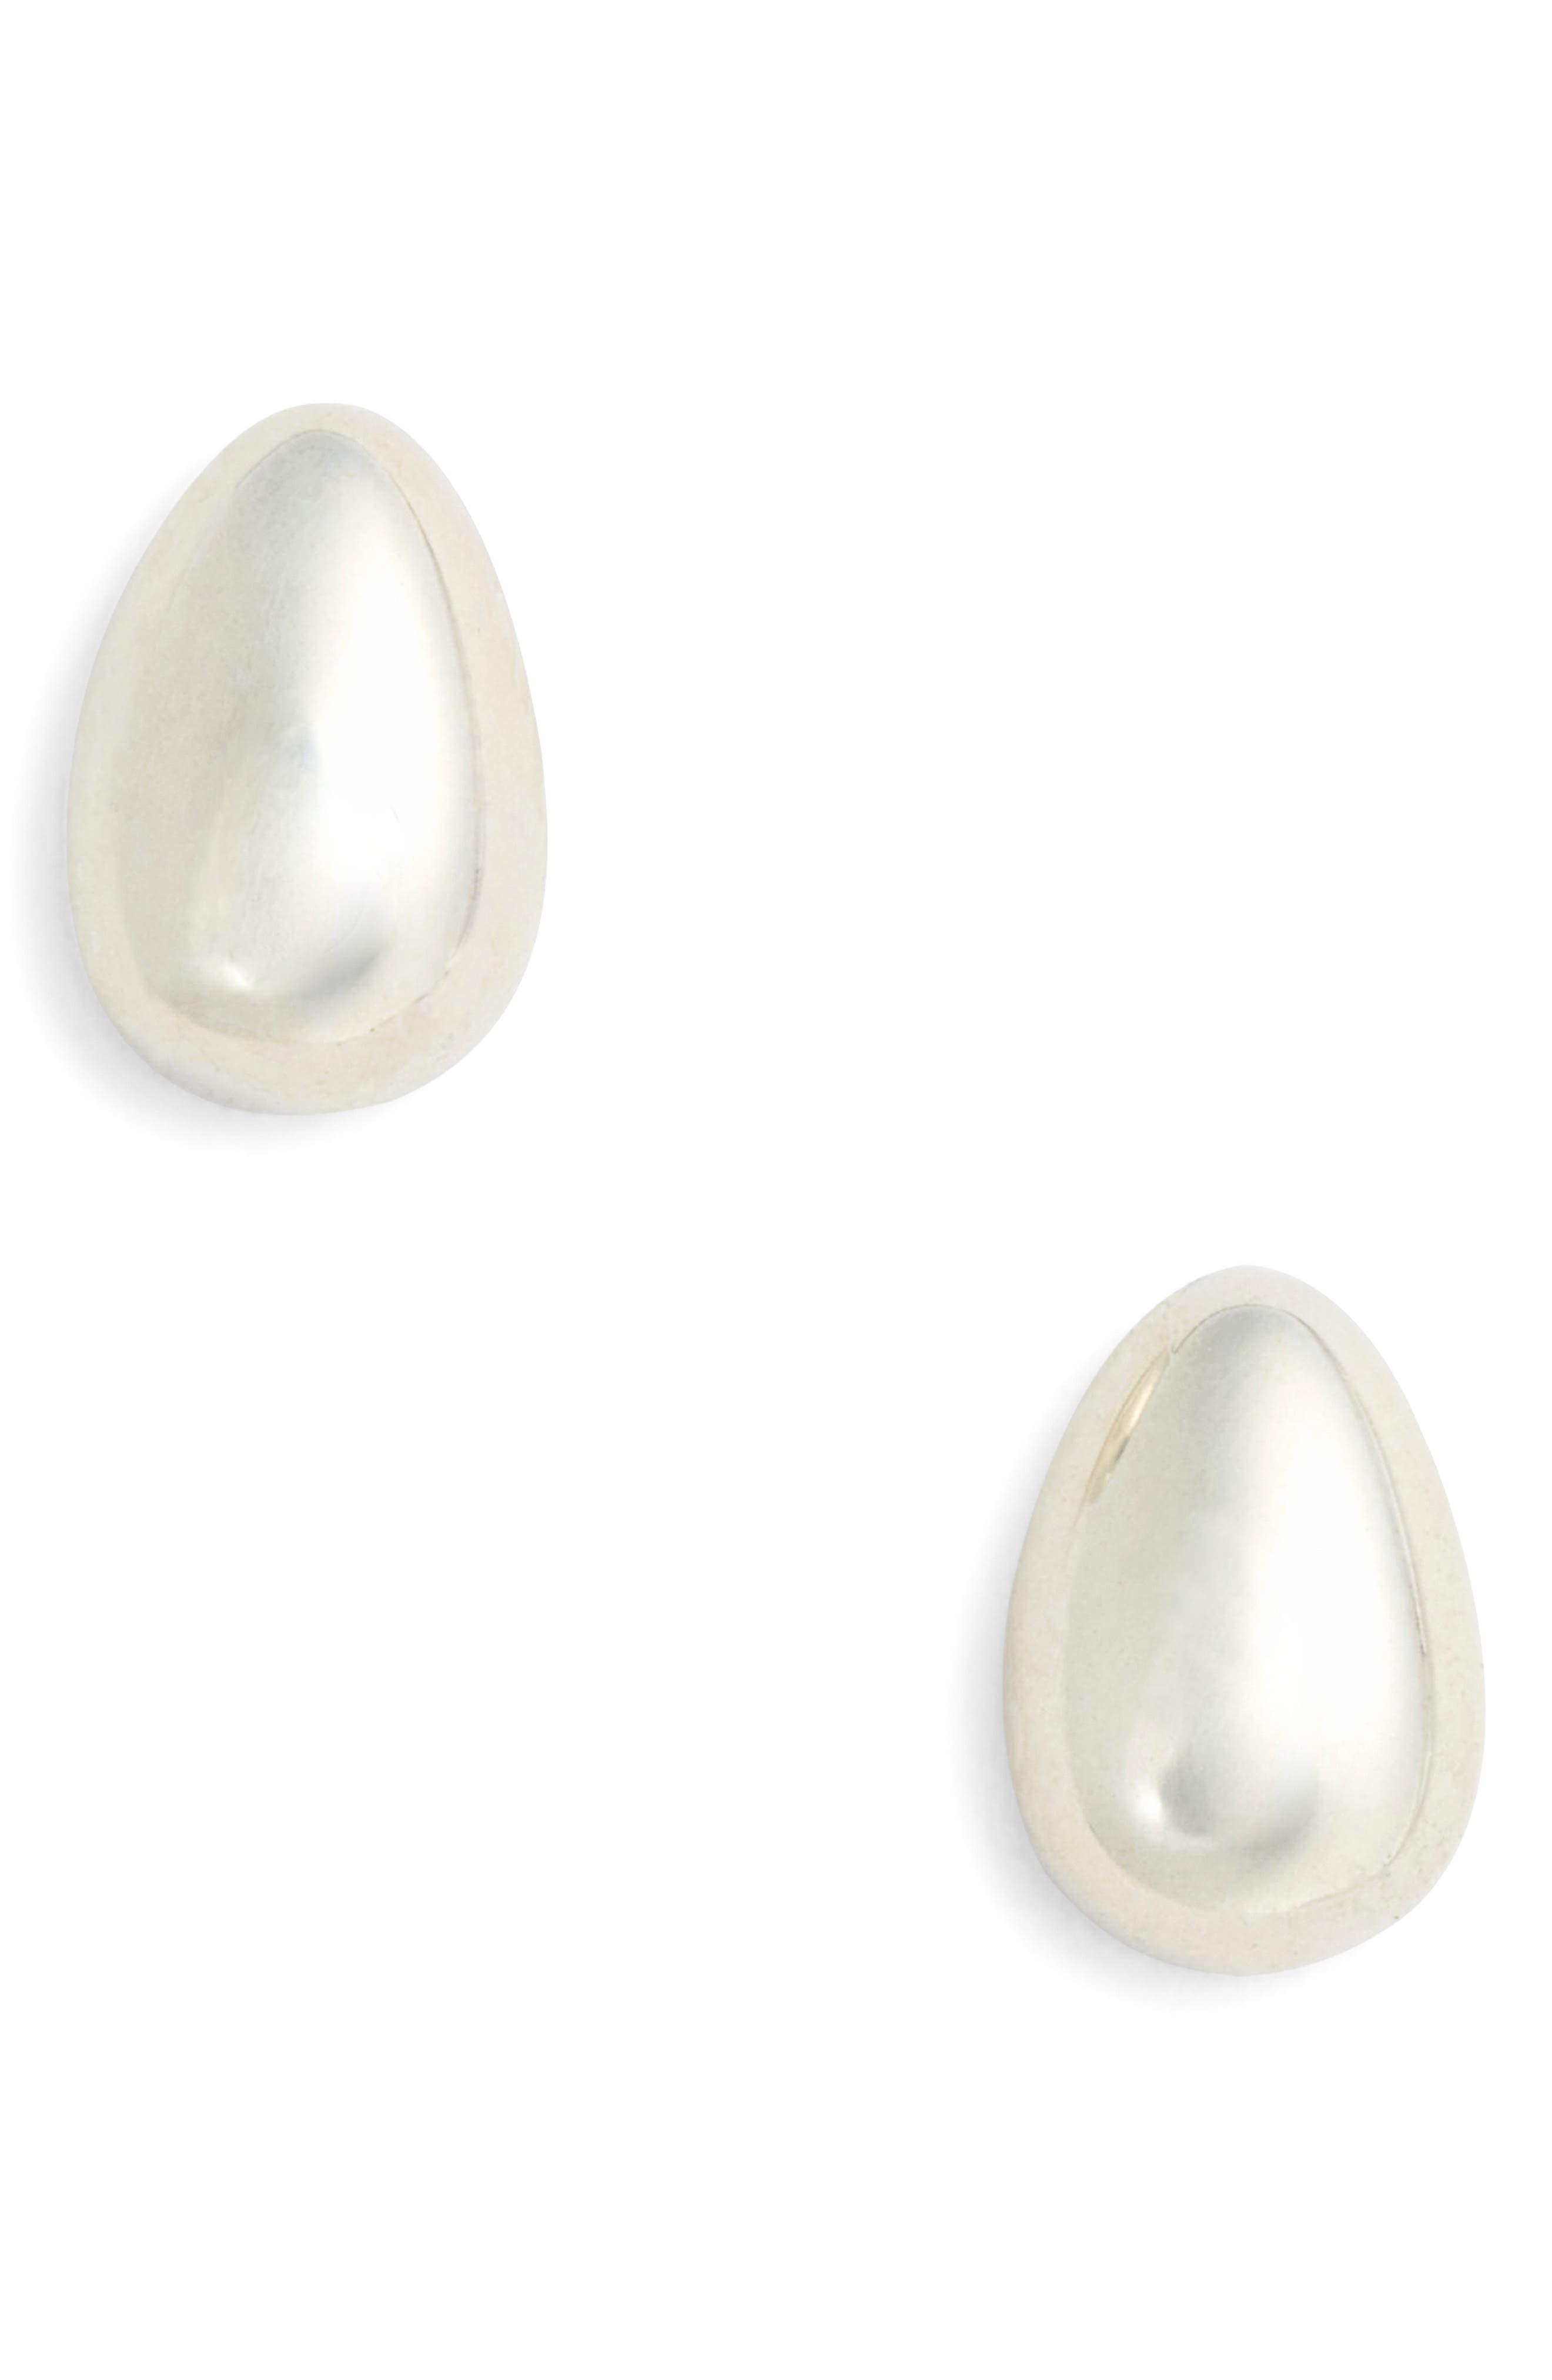 Tiny Egg Stud Earrings,                         Main,                         color, 040